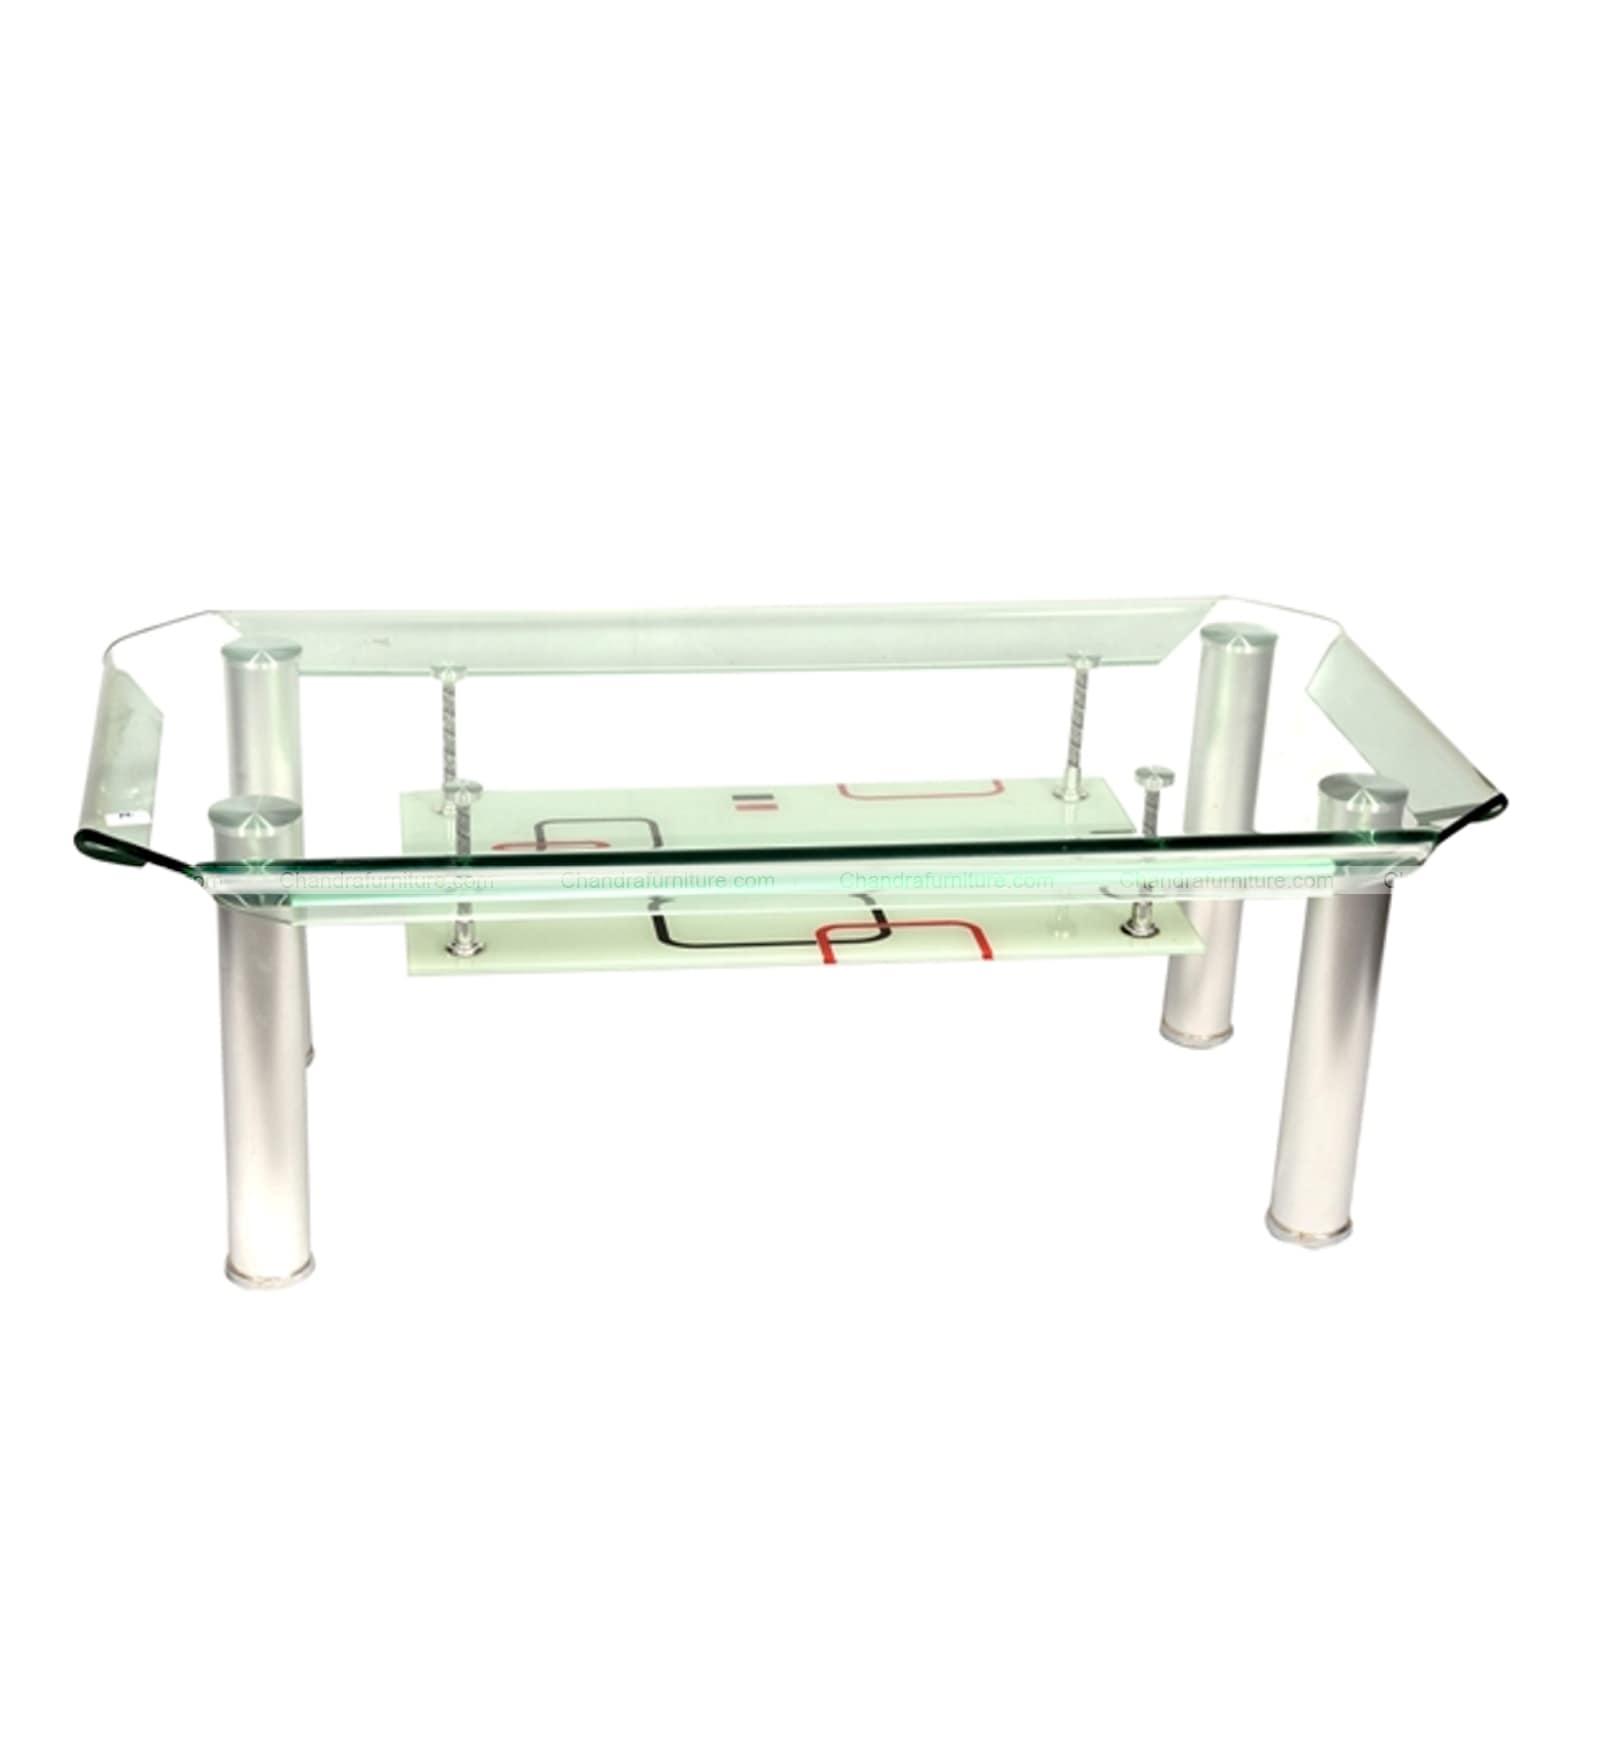 CHANDRA FURNITURE CENTER TABLE  4004